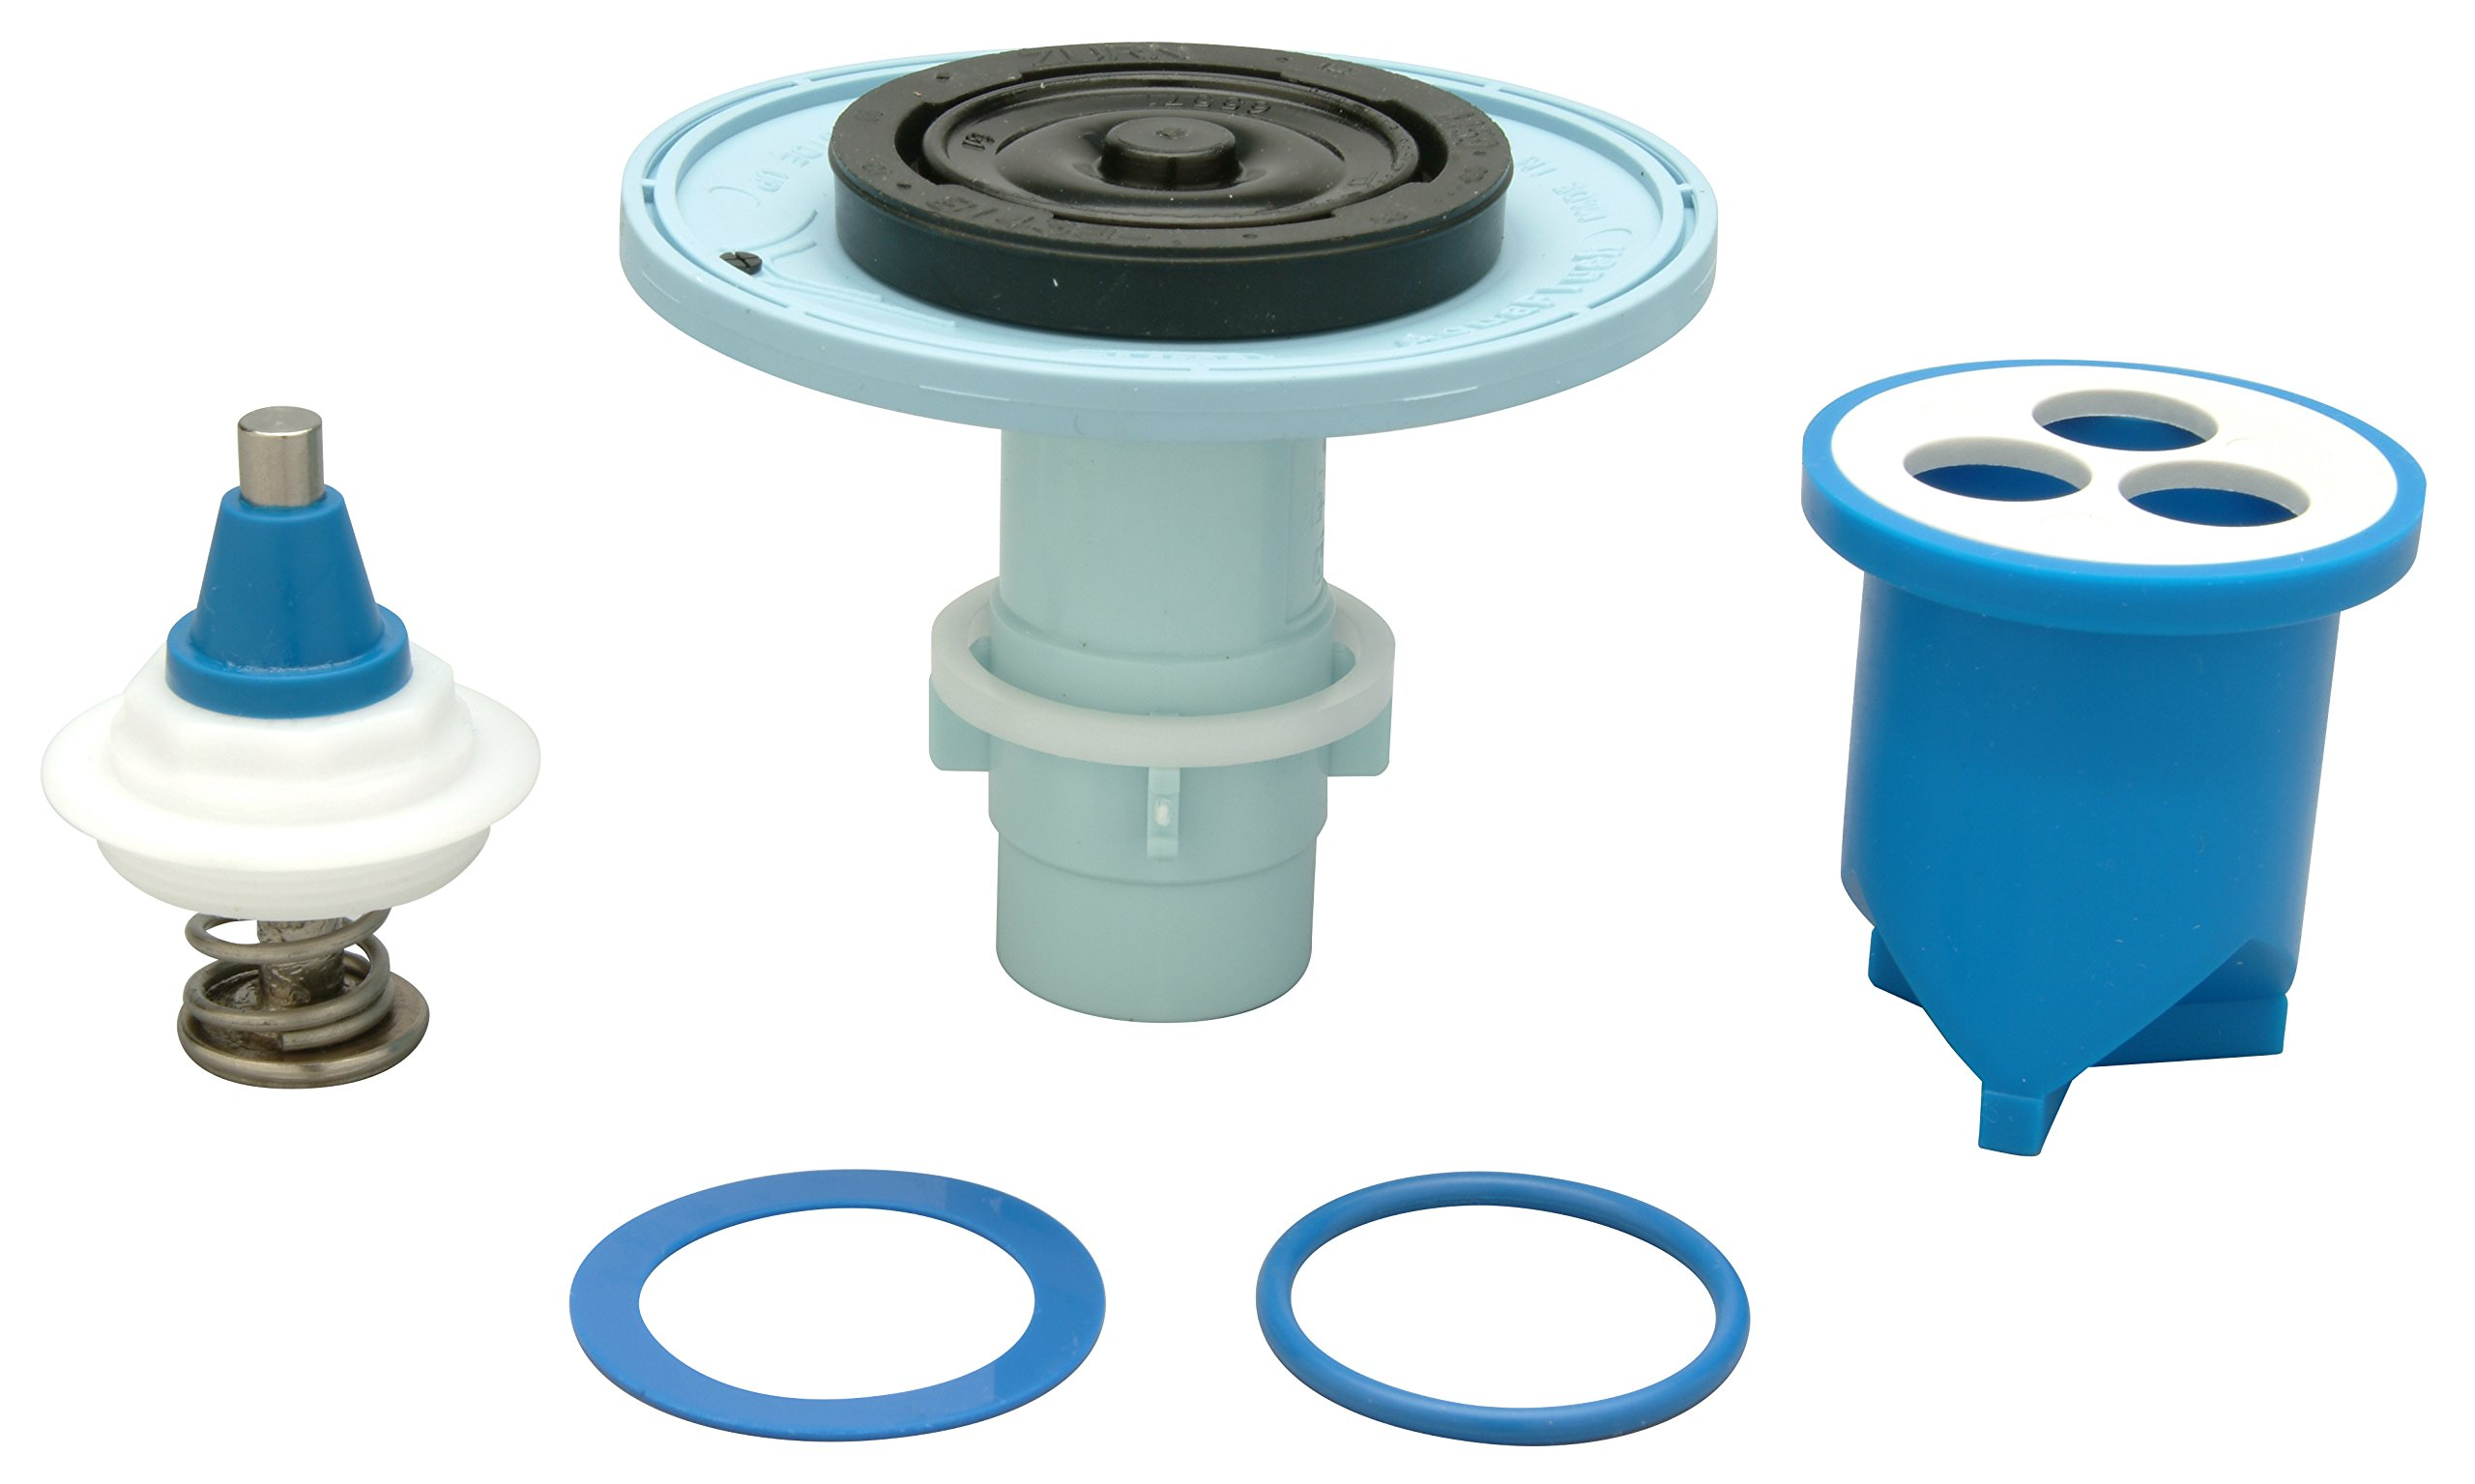 Zurn P6000-EUR-WS1-RK 1.0 gpf Urinal Aquaflush Diaphragm Kit Rebuild Kit by Zurn